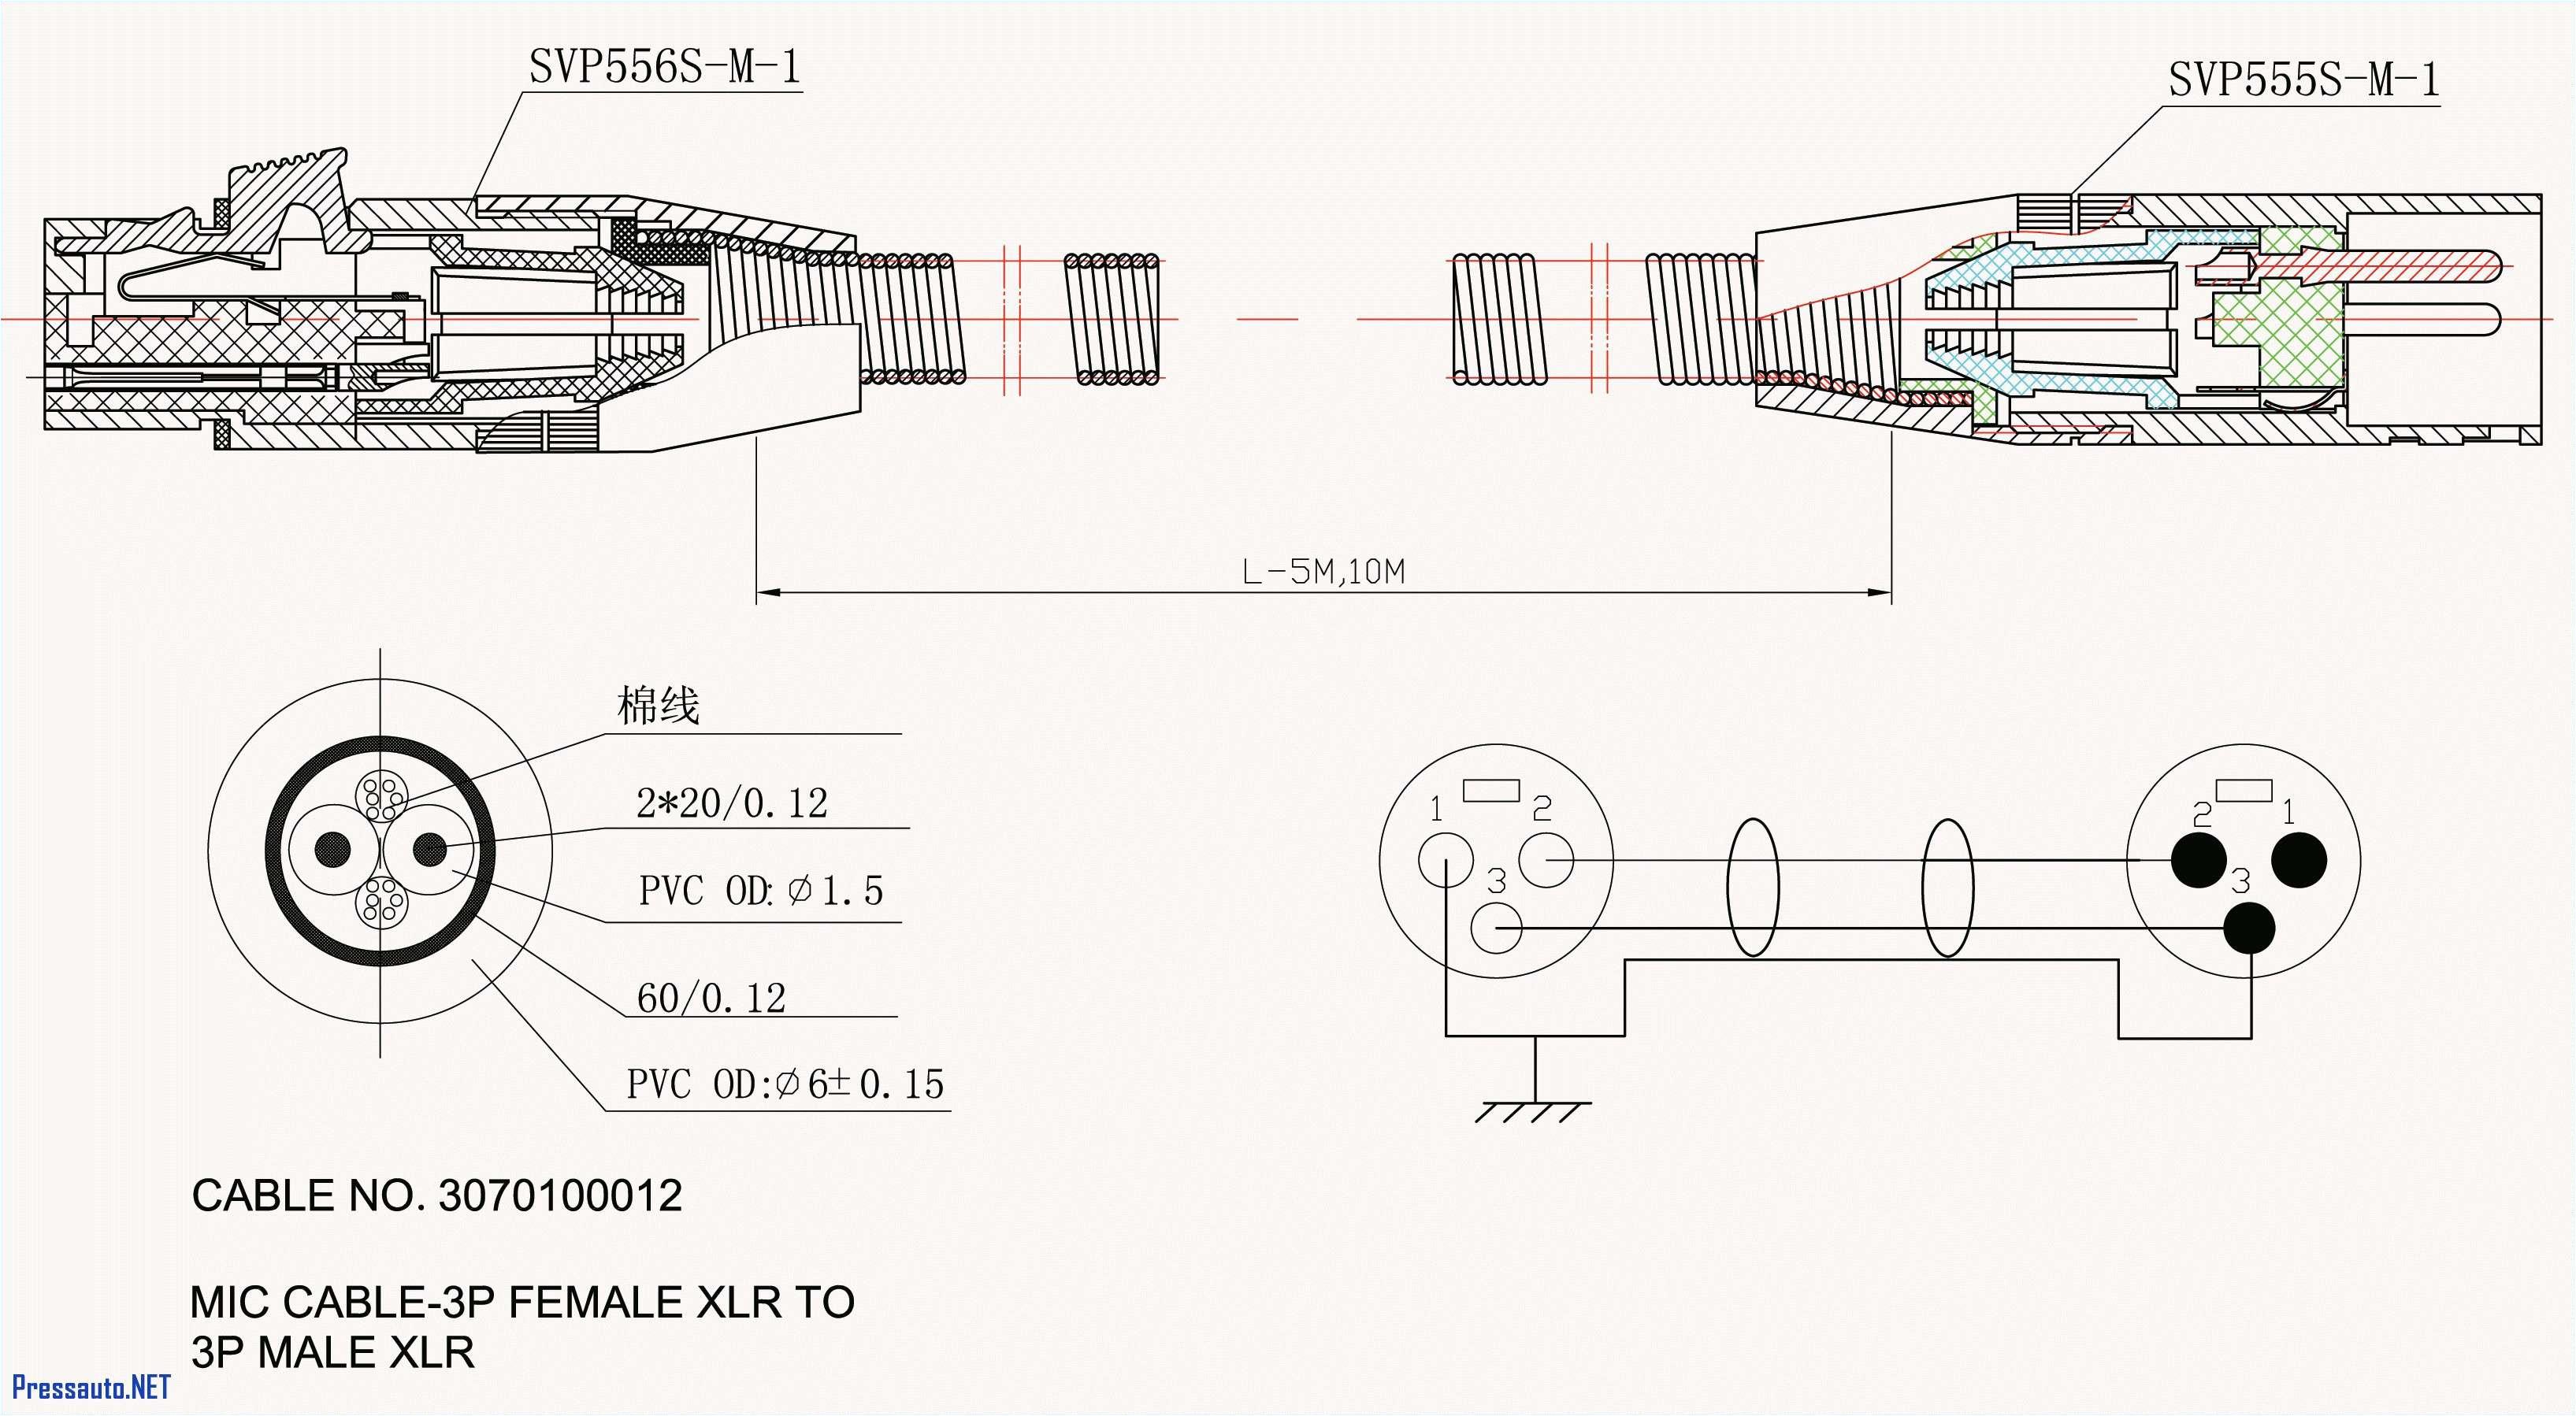 john deere 60 tractor wiring diagram design ideen von haus amp amp